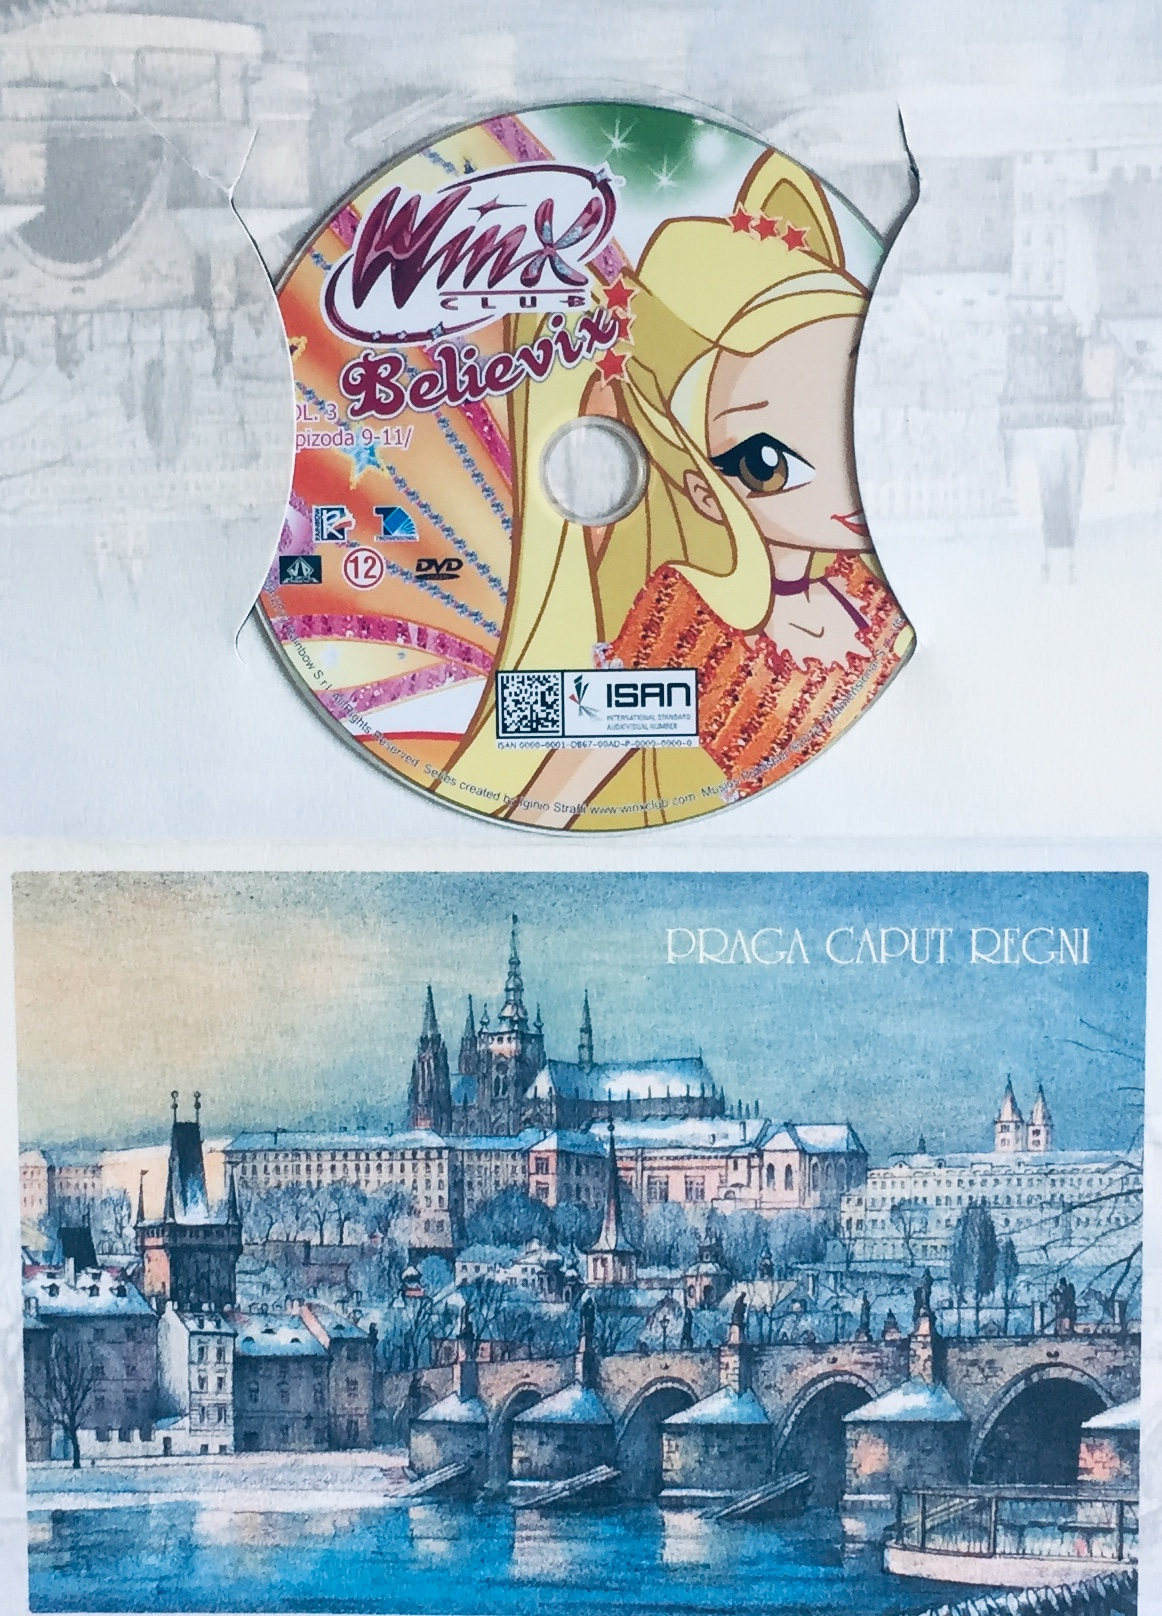 Winx Club - Believix - Vol. 3 - epizoda 9-11 - DVD /dárkový obal/